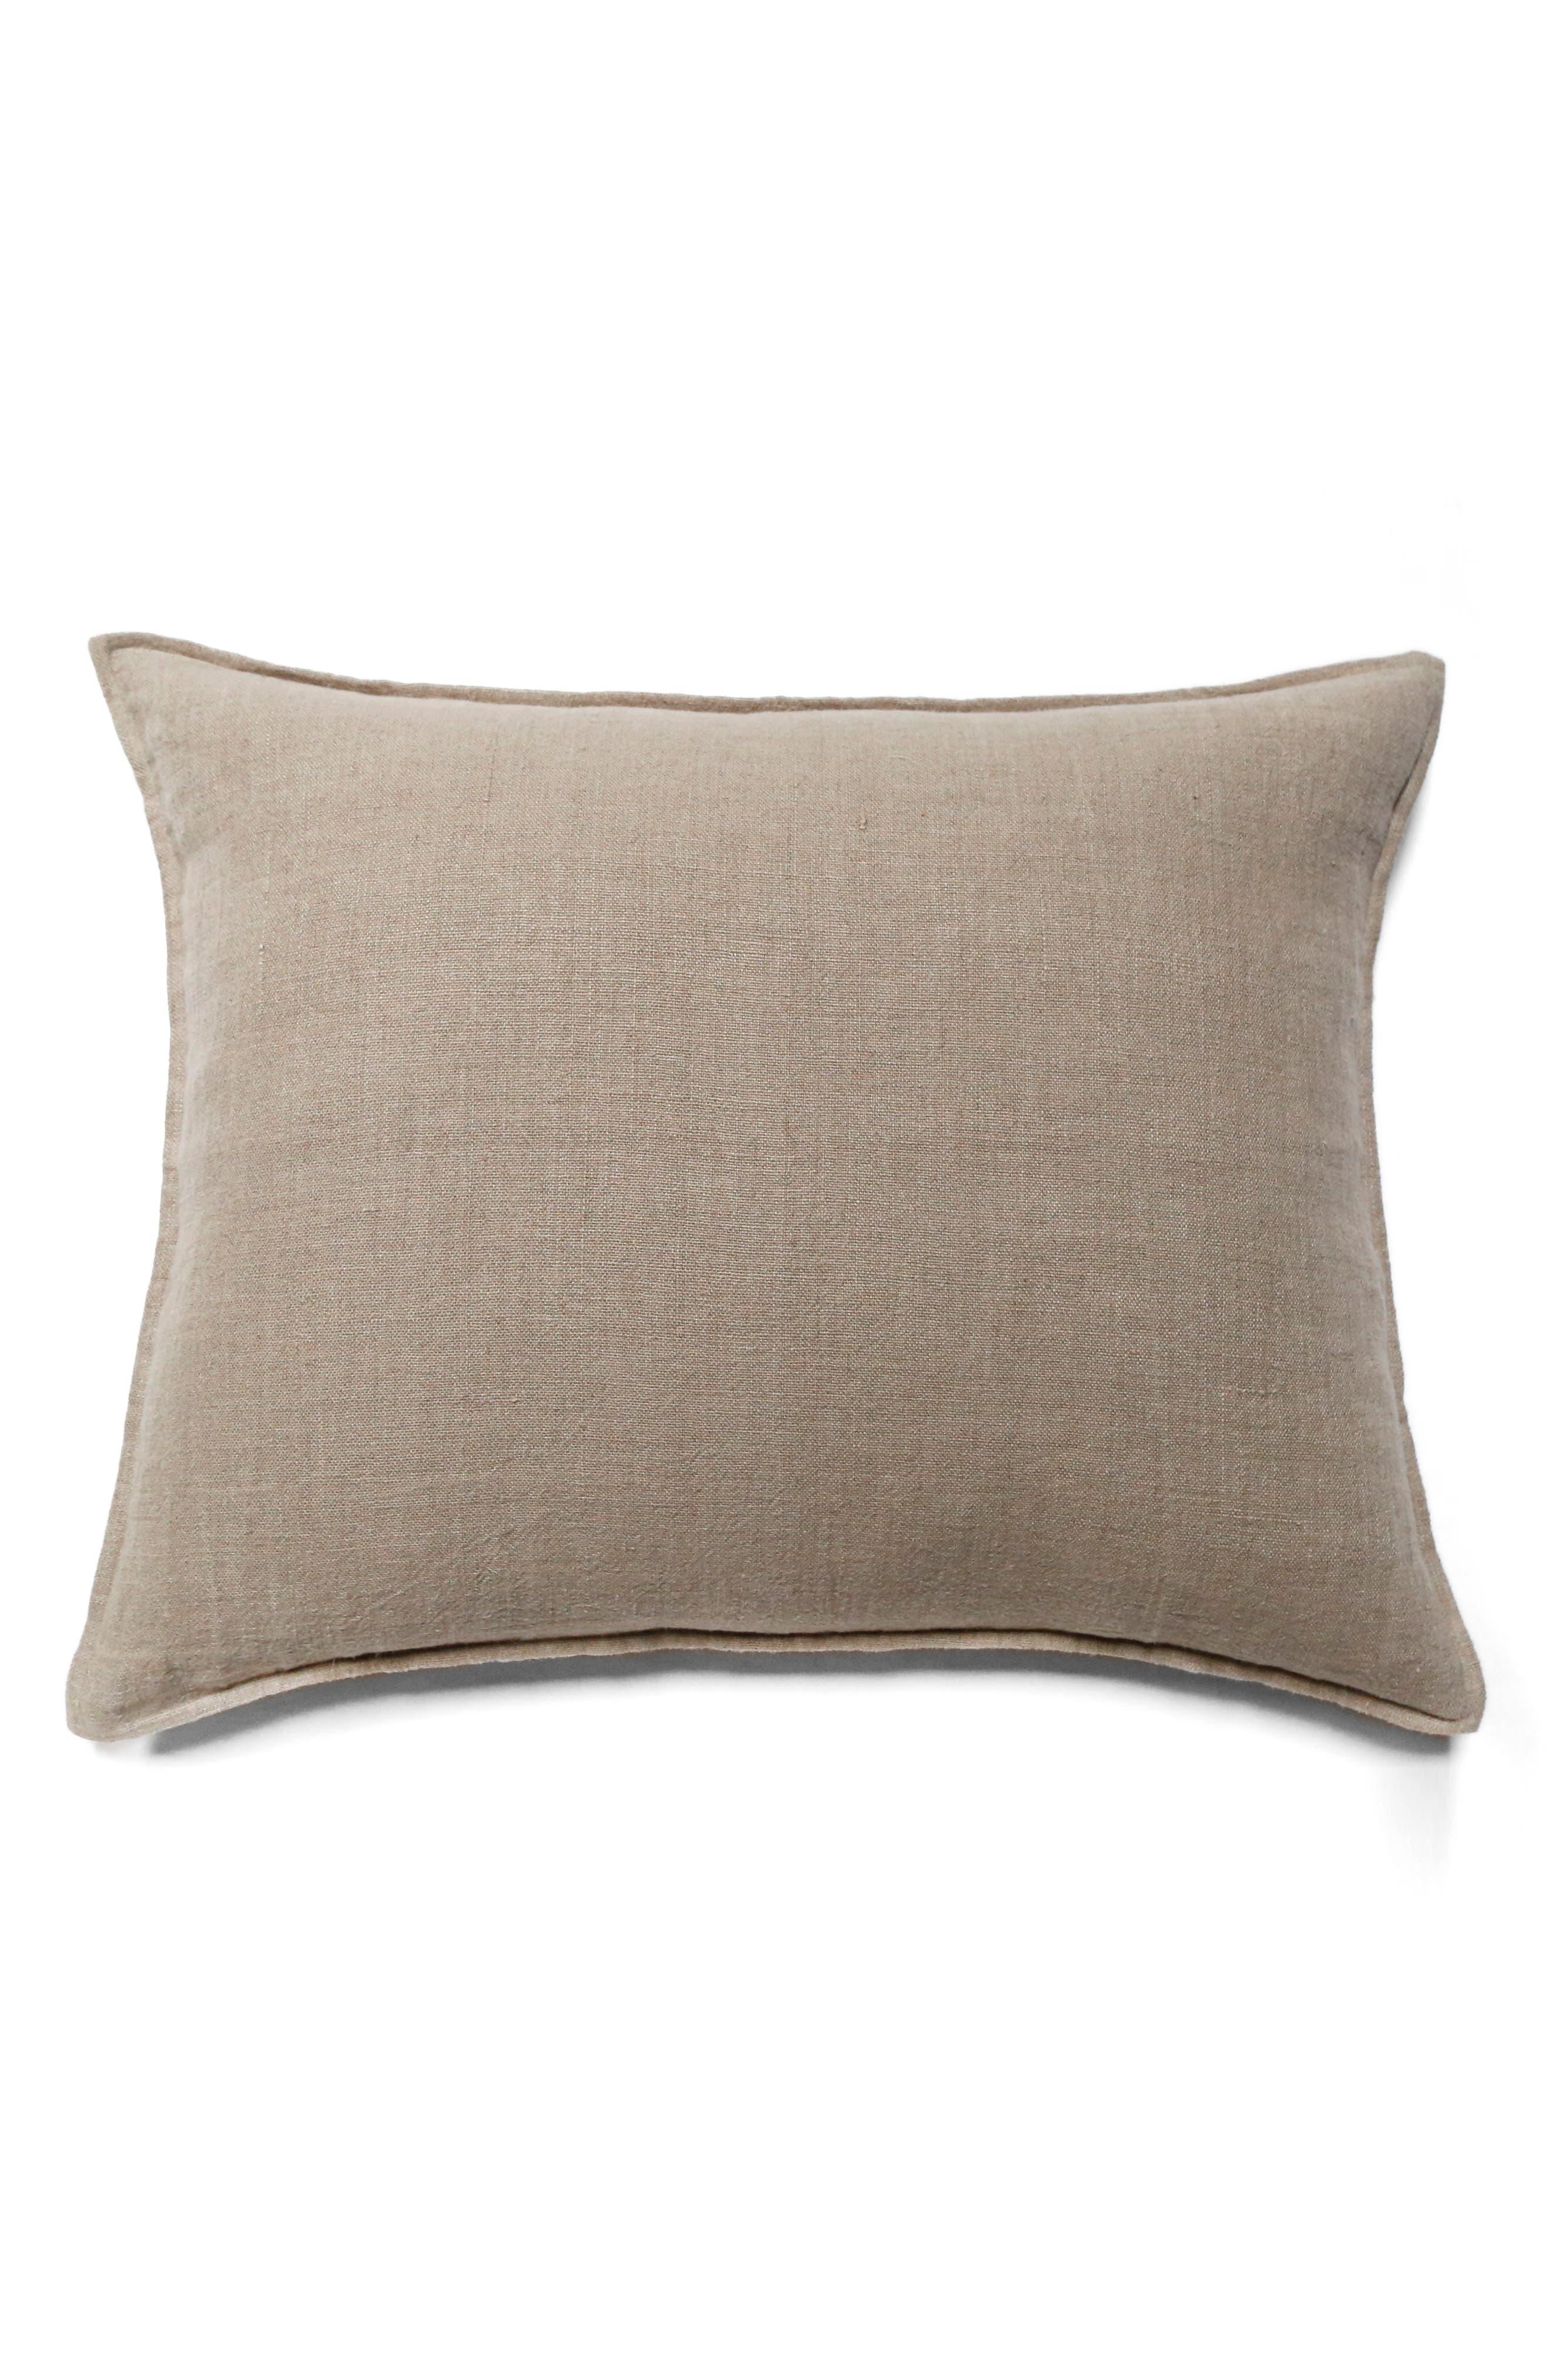 Montauk Big Accent Pillow,                             Main thumbnail 1, color,                             Brown